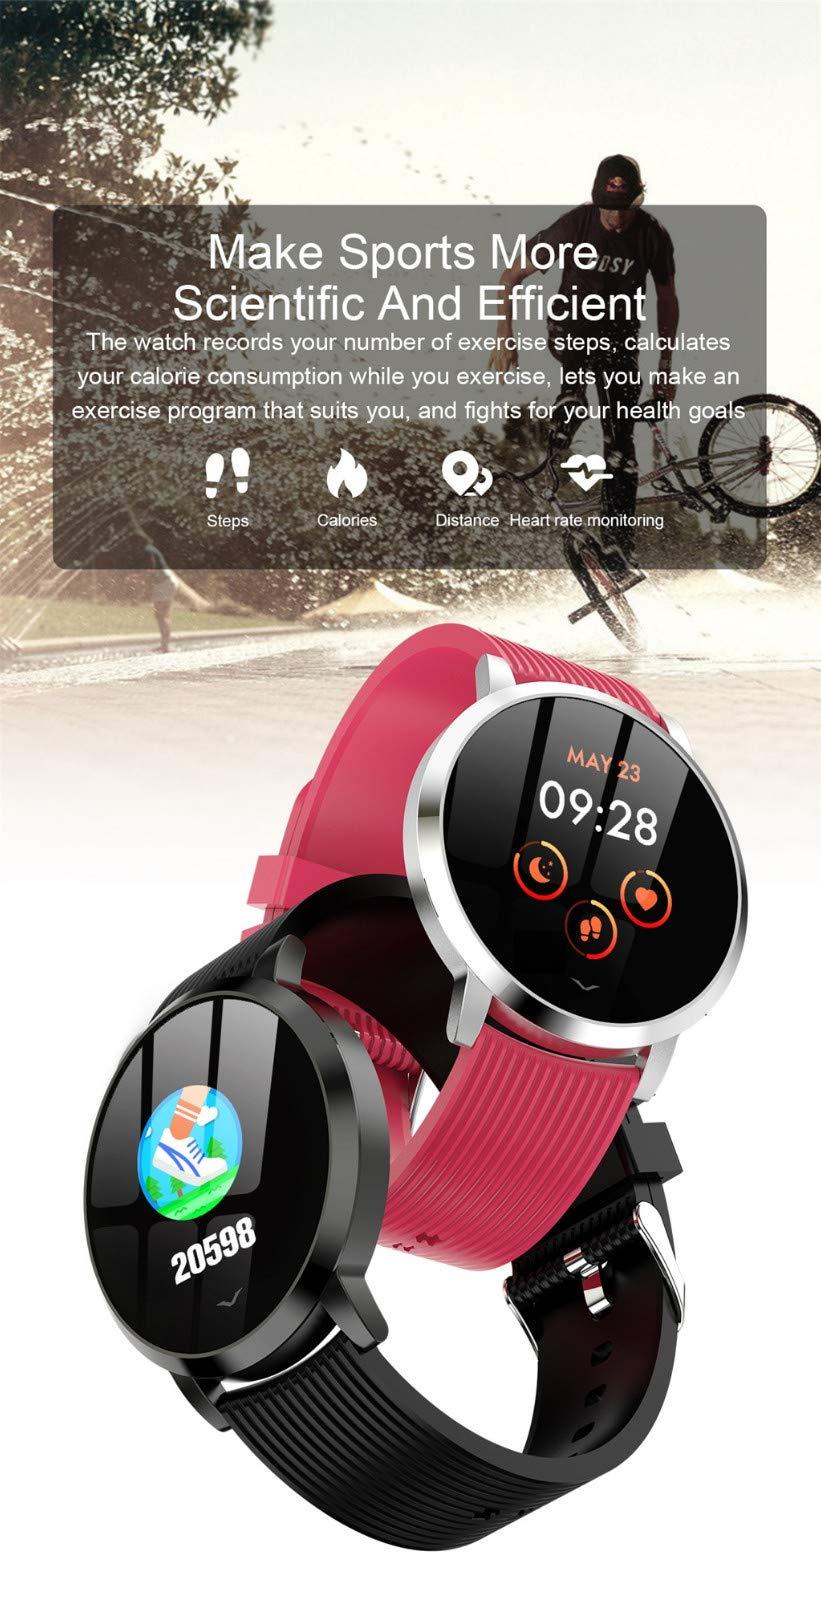 13-Zoll-Farbdisplay-Herzfrequenz-Blutdruck-Schlafberwachung-Smart-Watch-Band-Lv09-Smart-Armband-Smart-Uhr